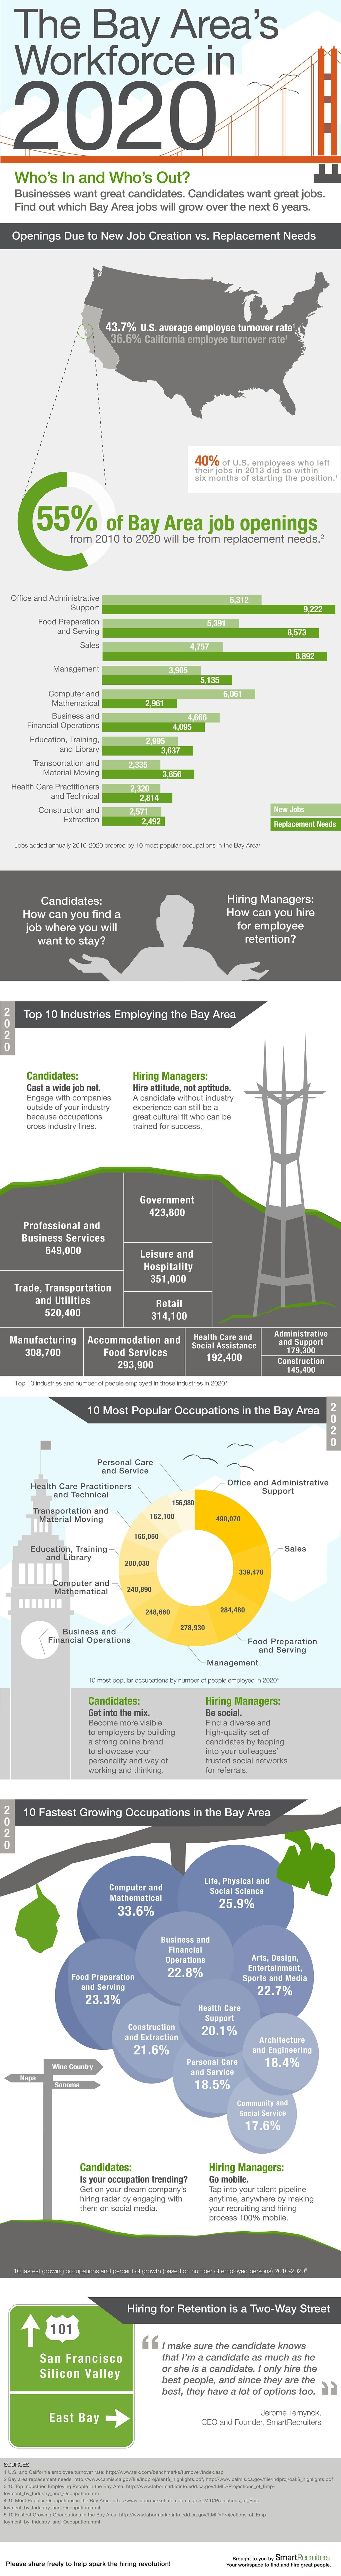 bay area's workforce